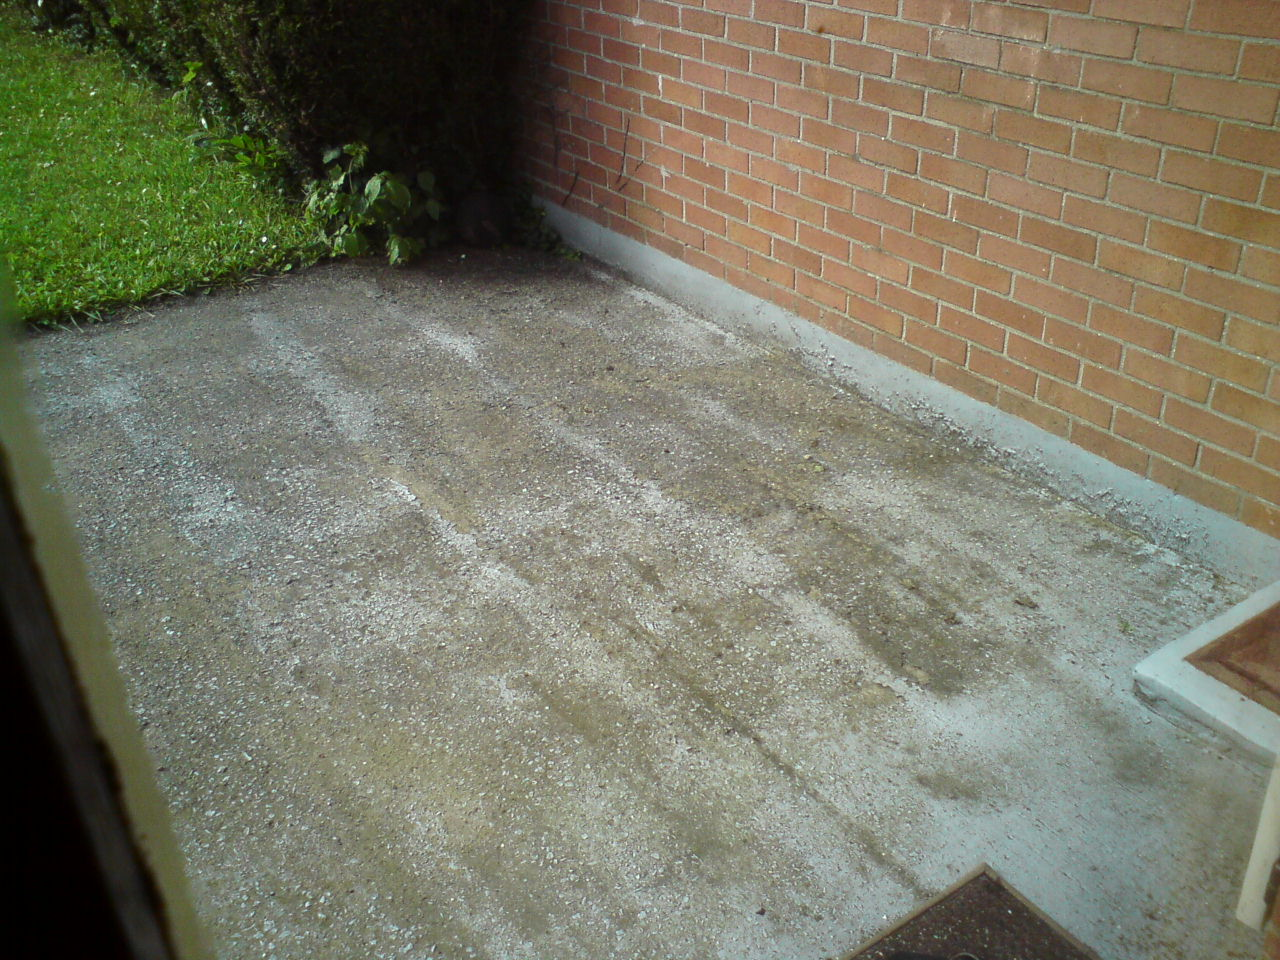 Terrasse peindre ou carreler ou autre for Carreler une terrasse en beton